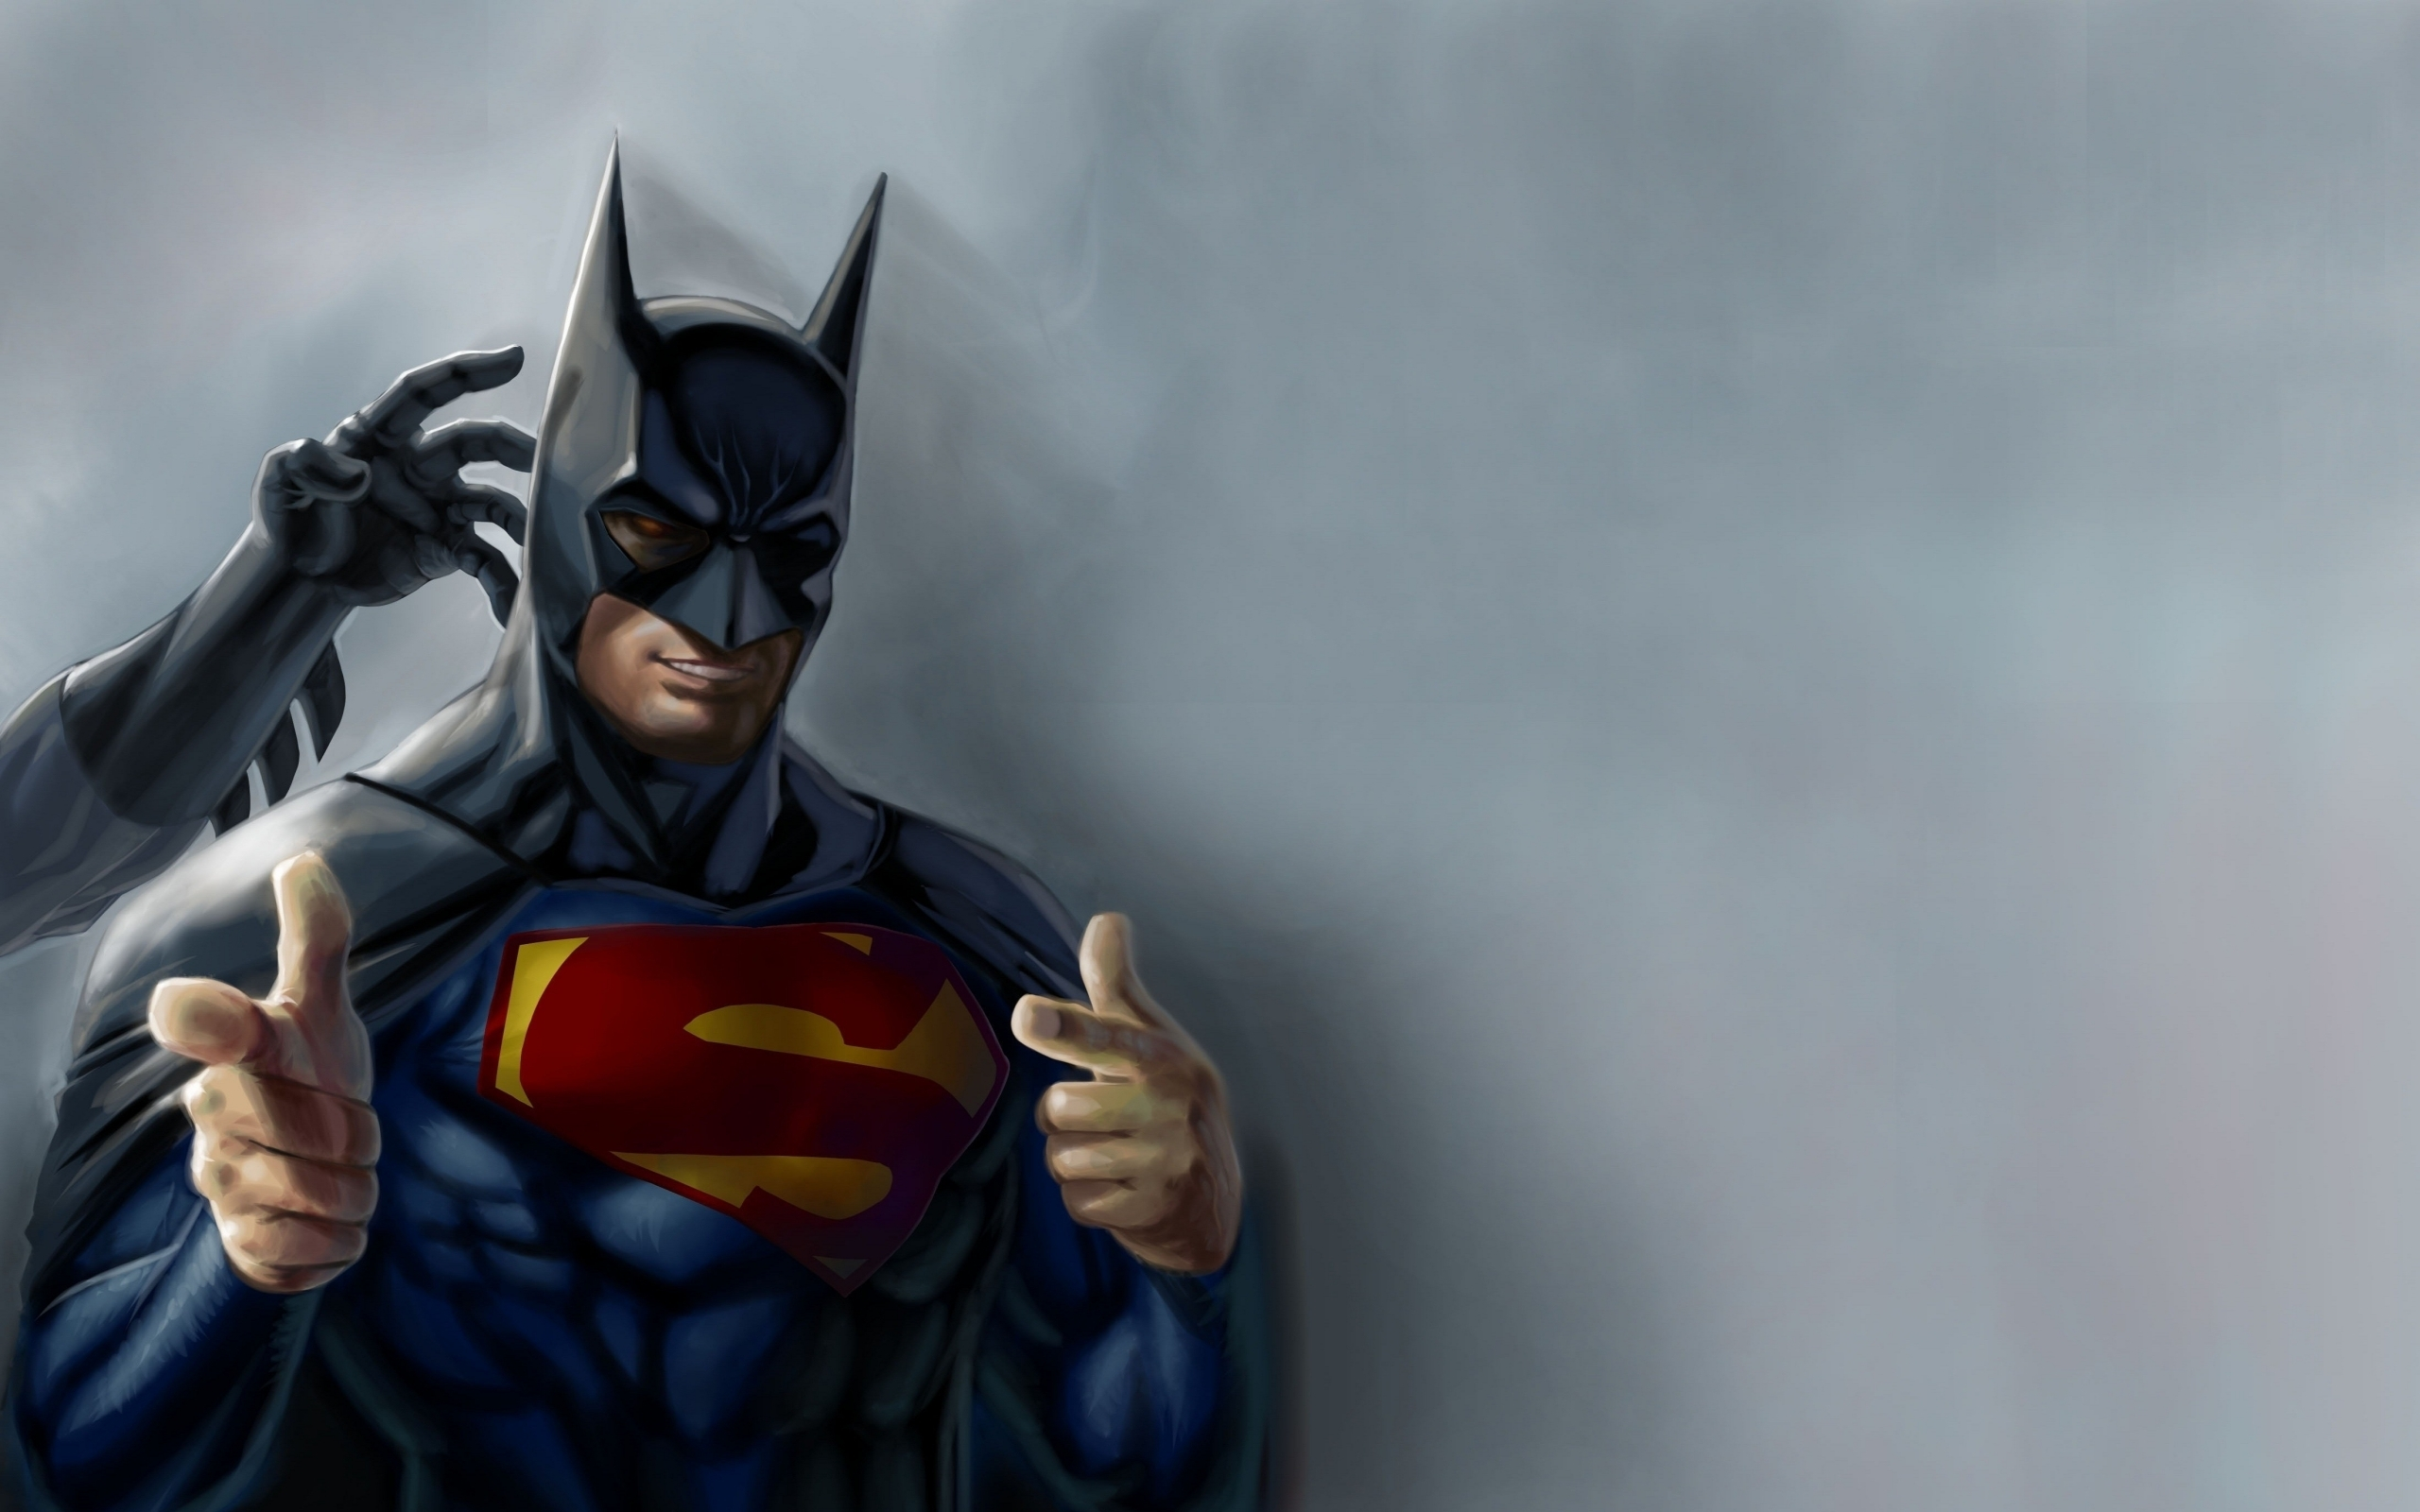 humor funny superhero wallpaper 2560x1600 117305 WallpaperUP 2560x1600